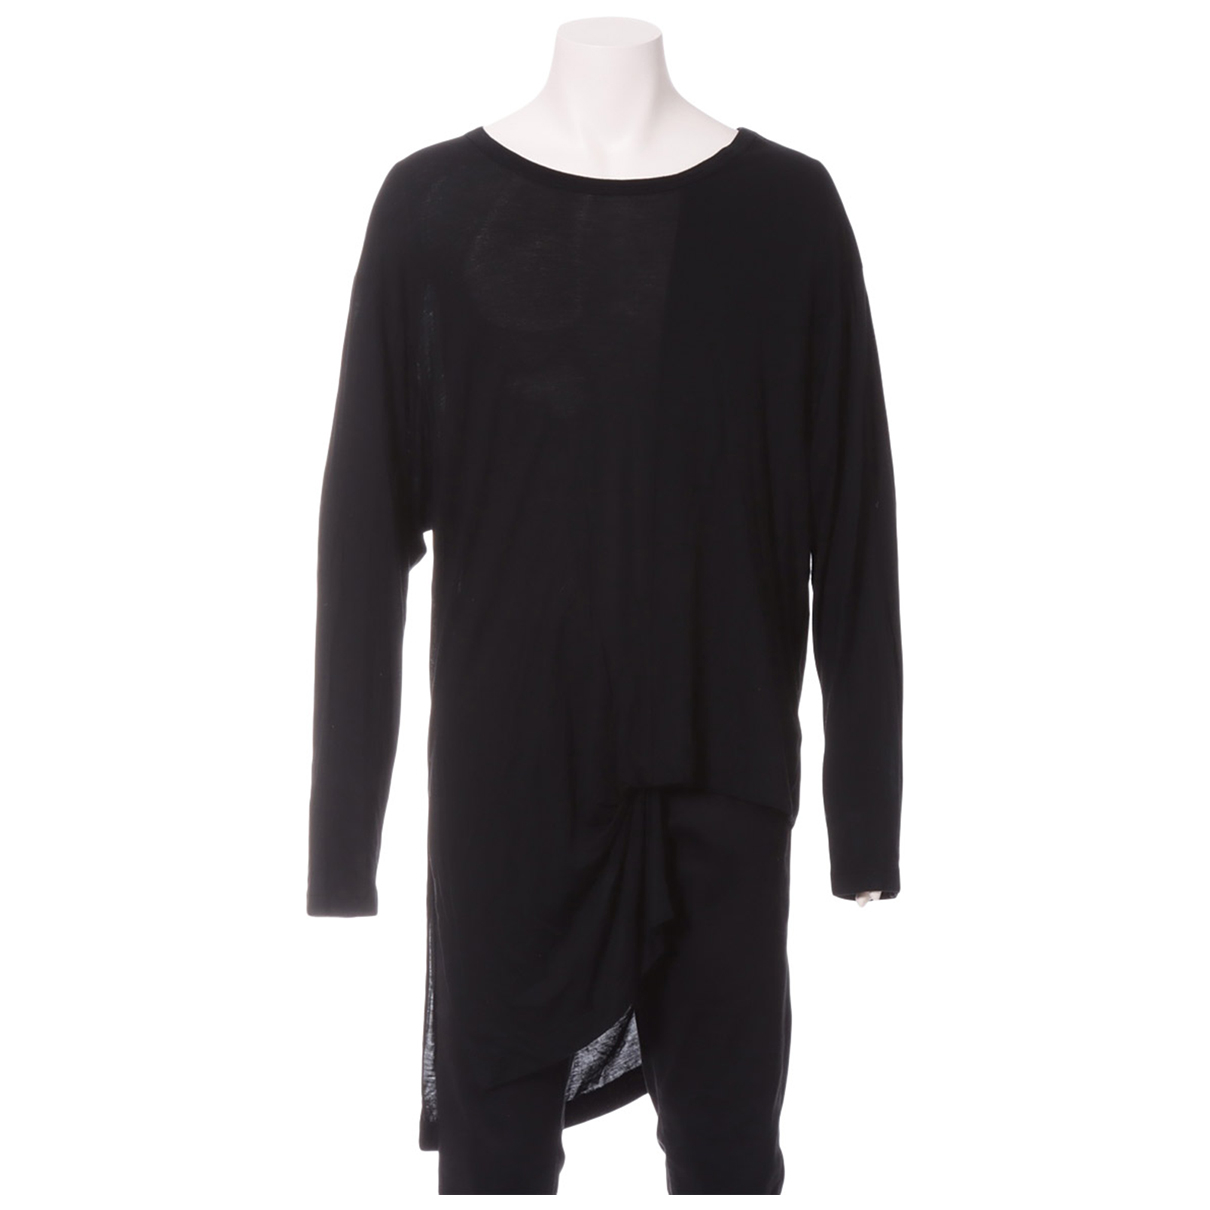 Yohji Yamamoto N Black T-shirts for Men 3 0 - 6